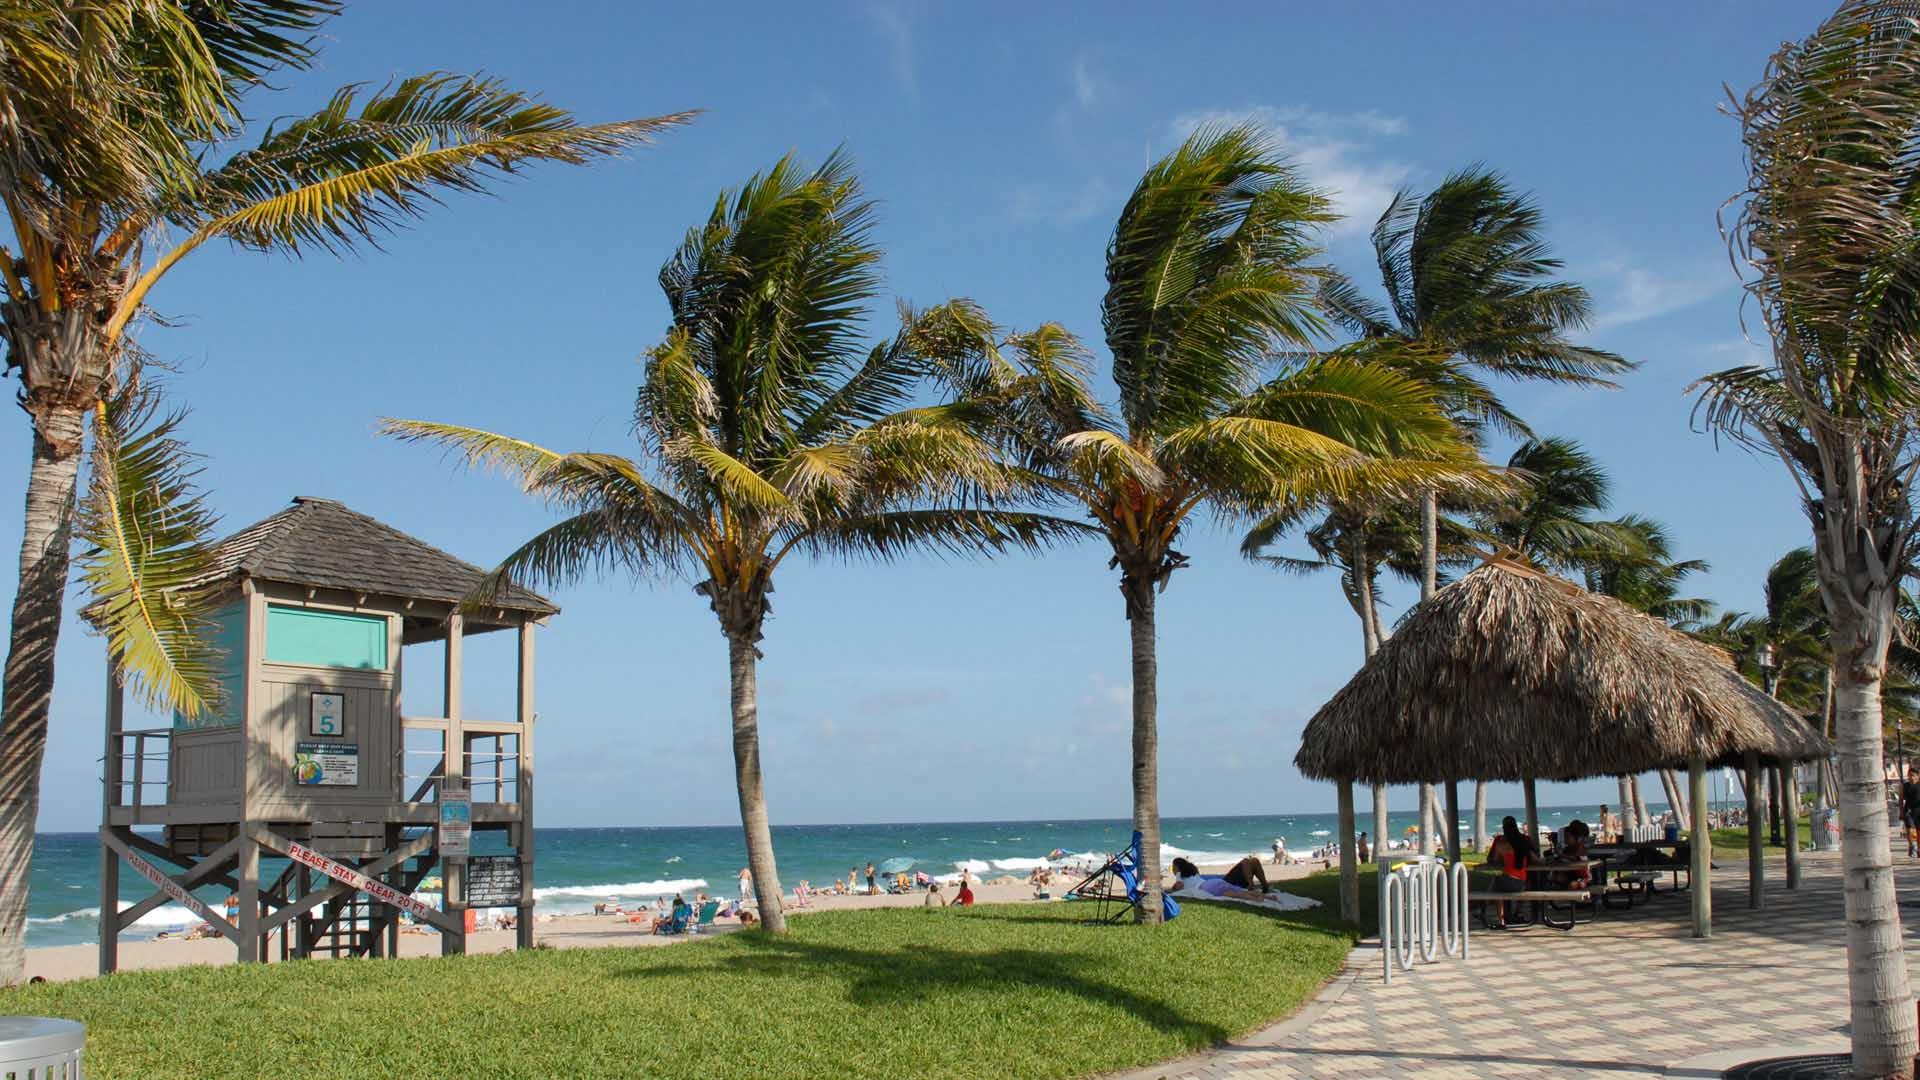 deerfield girls The boys & girls club moran unit, deerfield beach, florida 108 likes sports club.